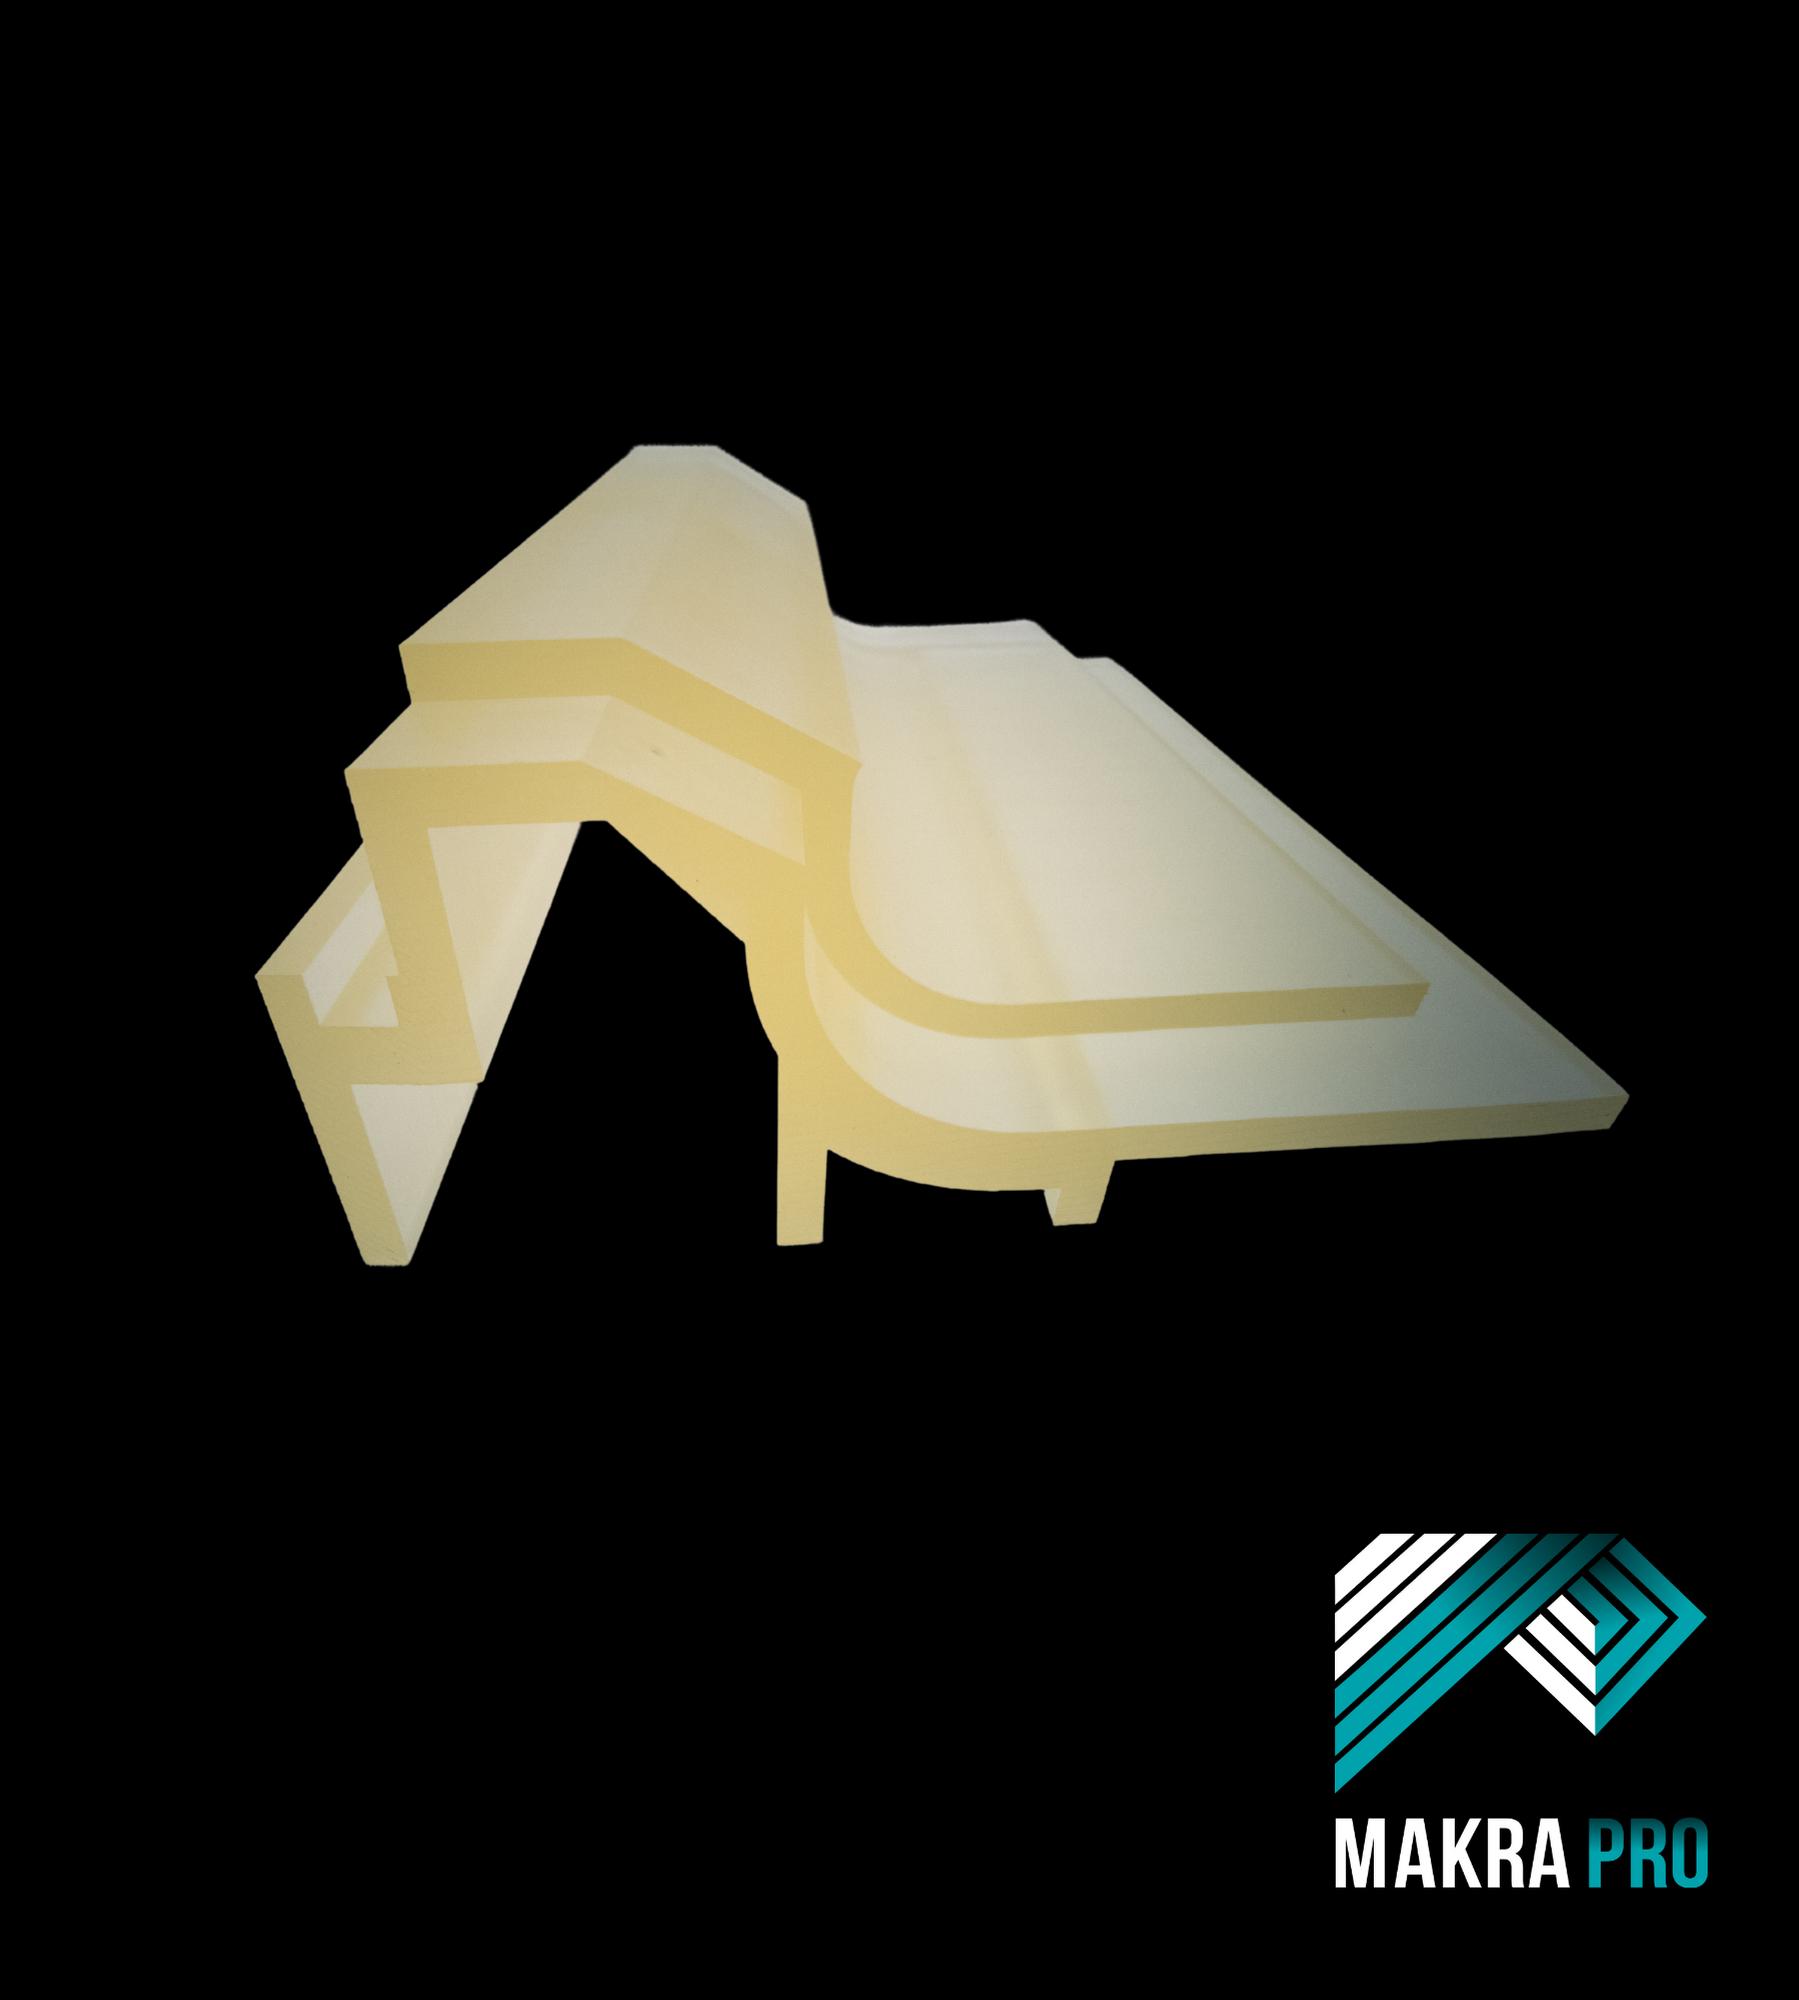 Prototyp 3D Druck Makra Pro